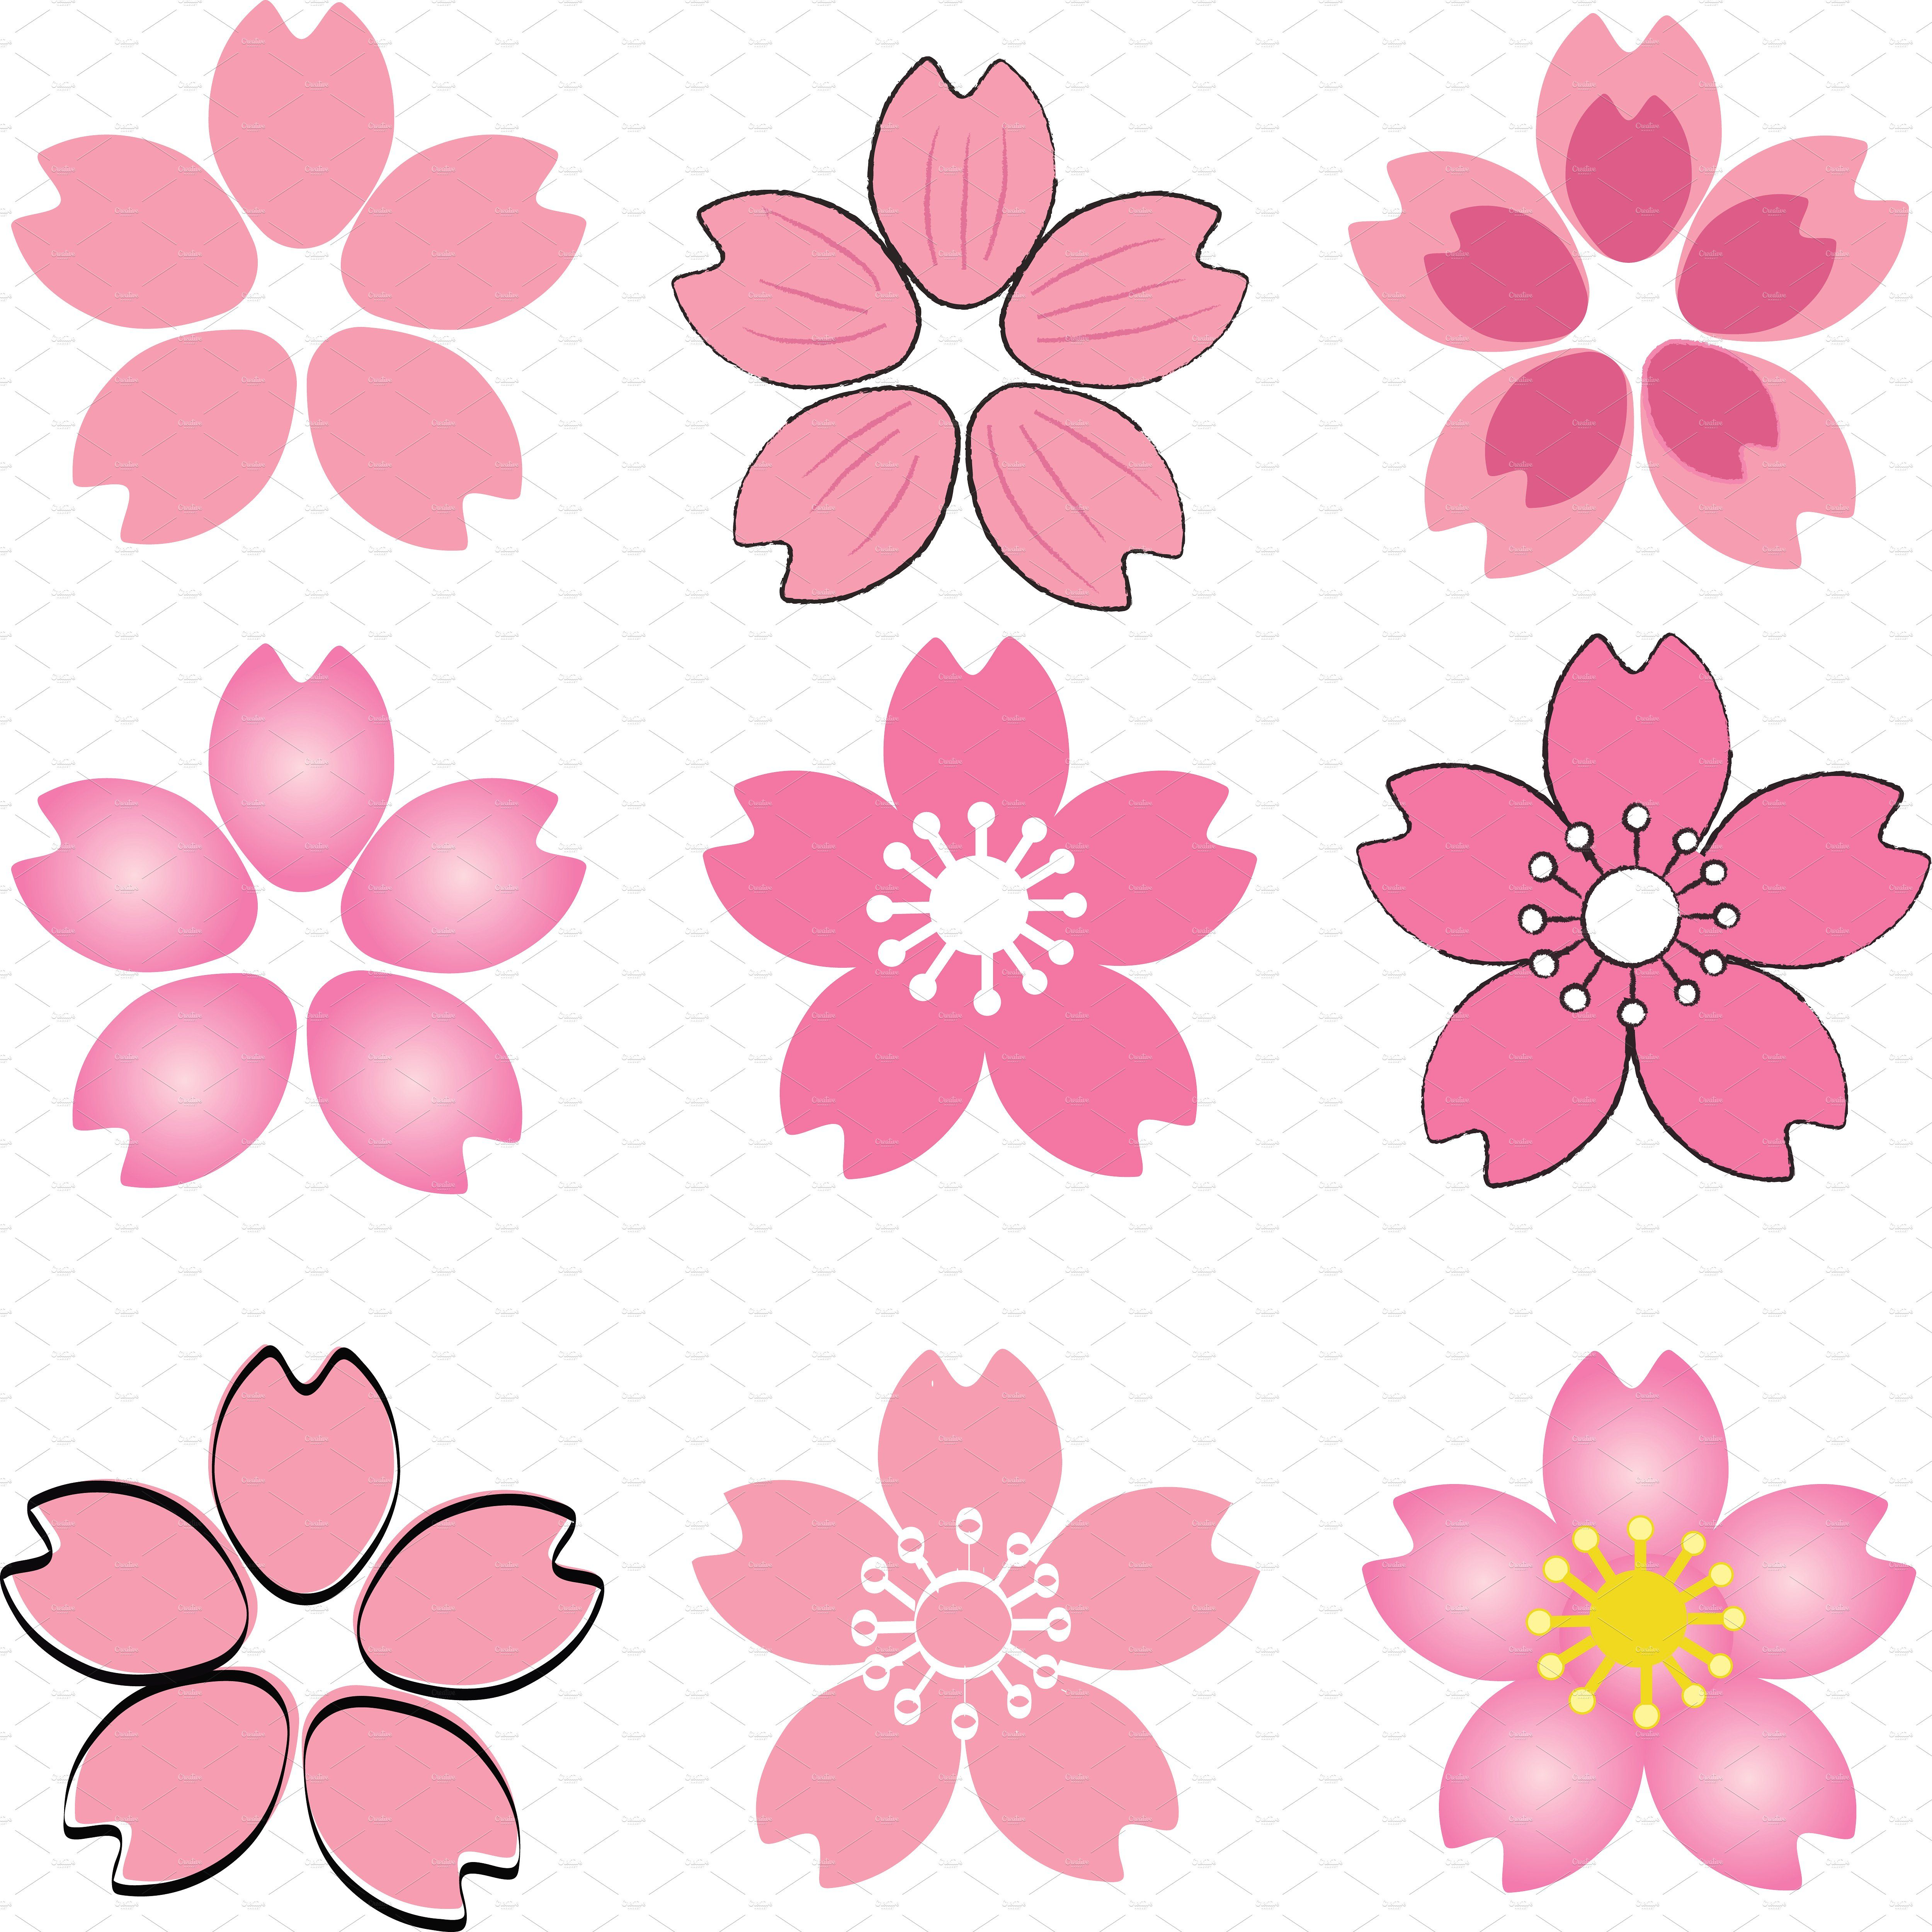 Set Of Pink Cherry Blossom Cherry Blossom Drawing Cherry Blossom Petals Cherry Blossom Flowers